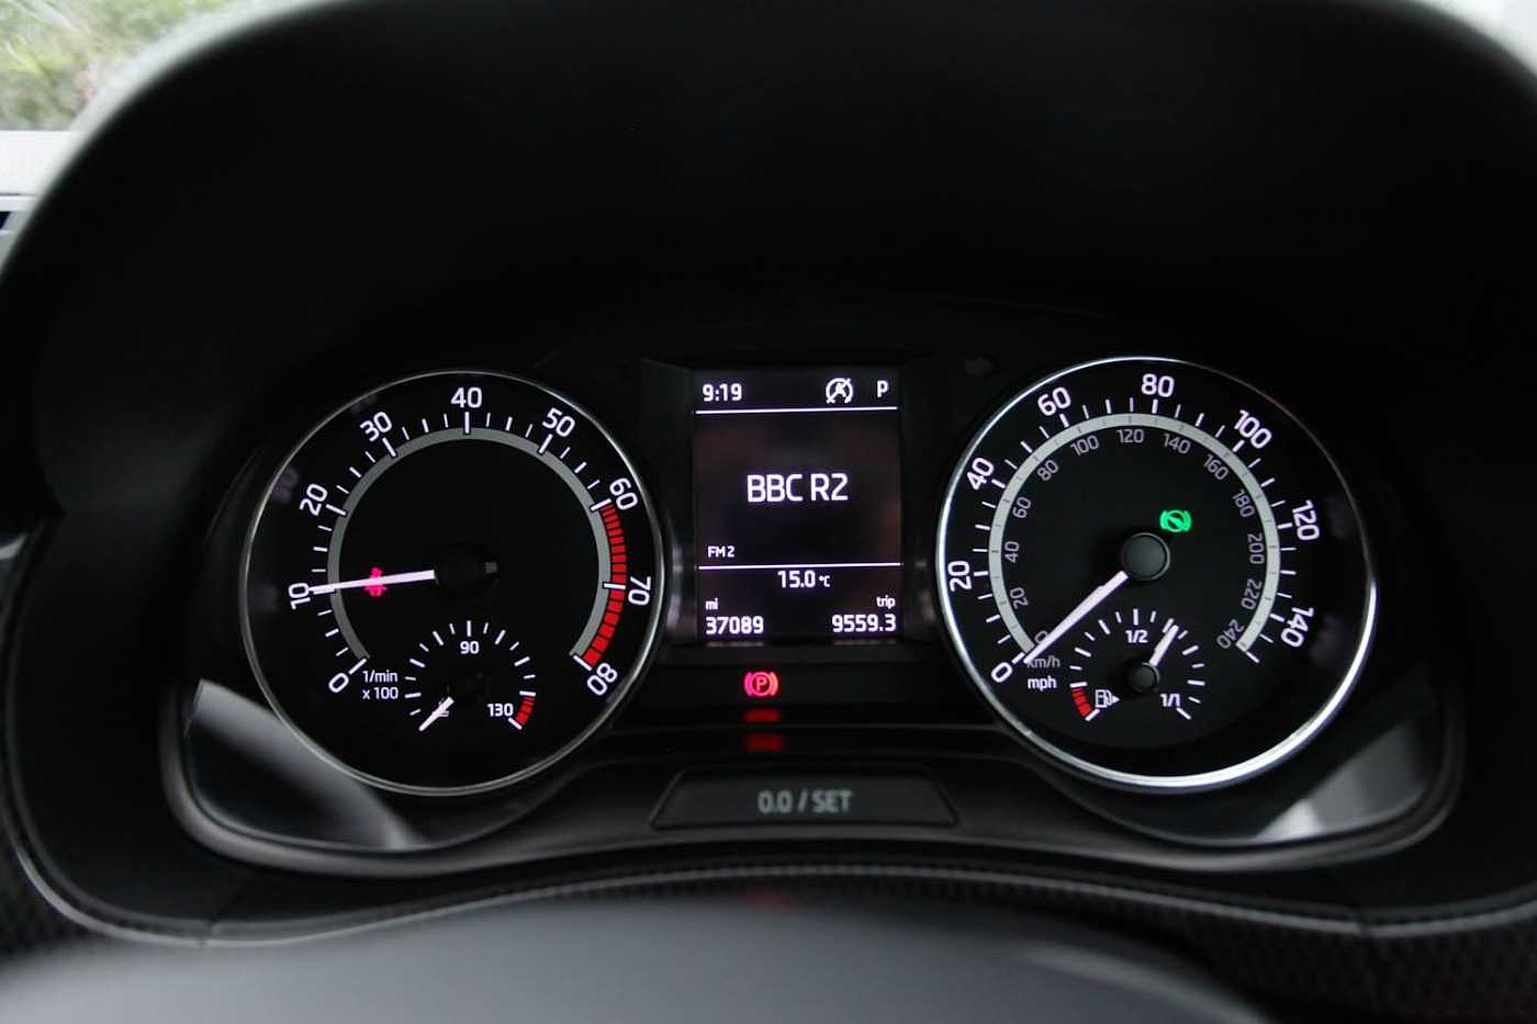 Skoda Fabia 1 0 Tsi Monte Carlo 110ps Ss Dsg Hatchback